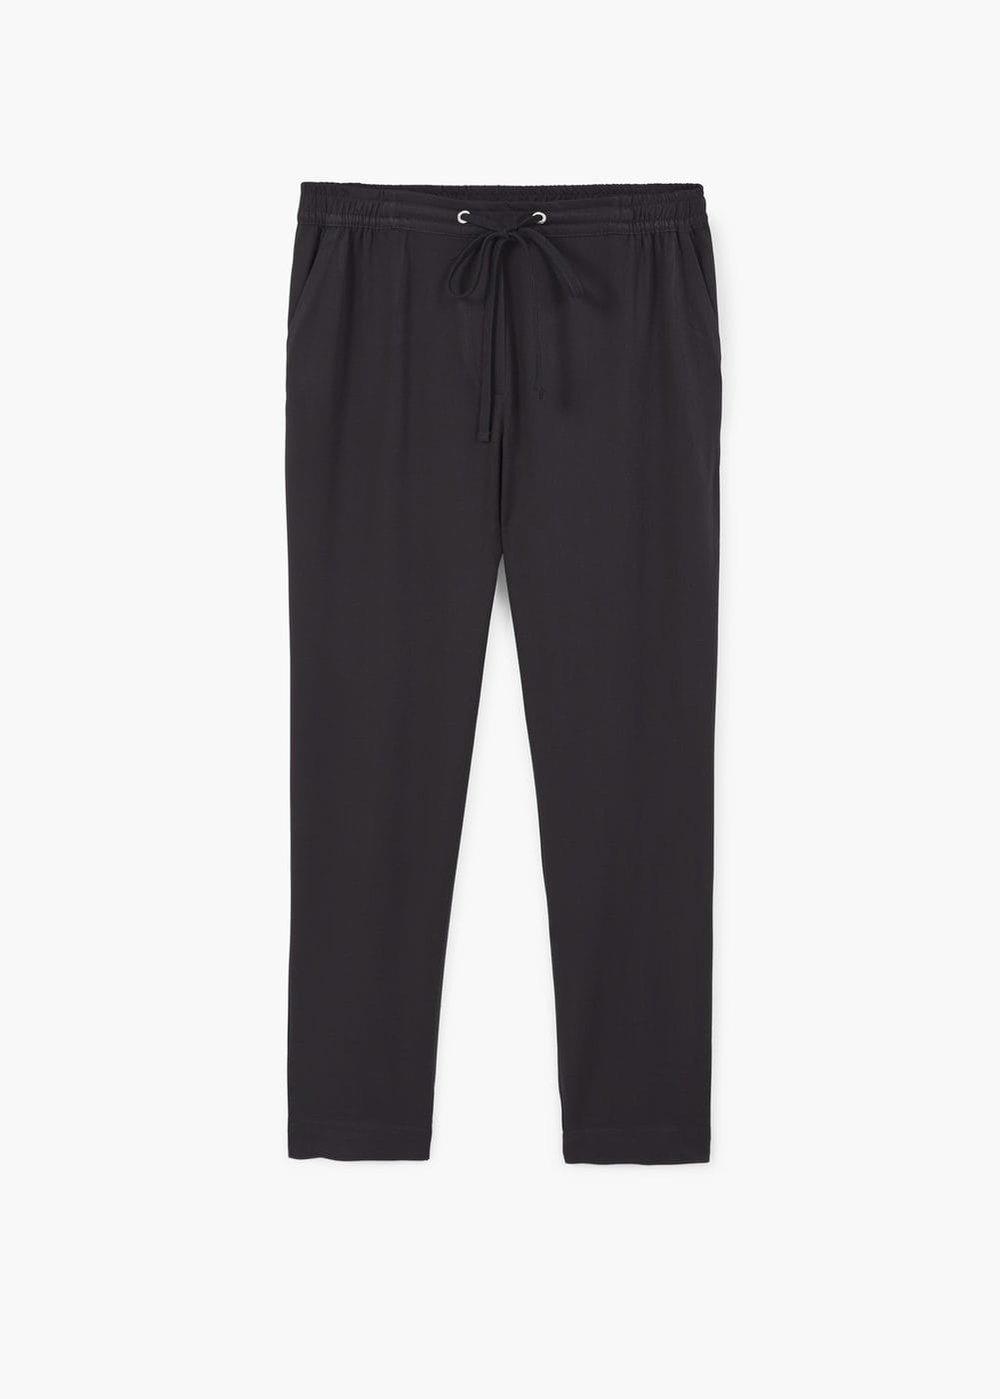 Mango Flowy pants $35.99